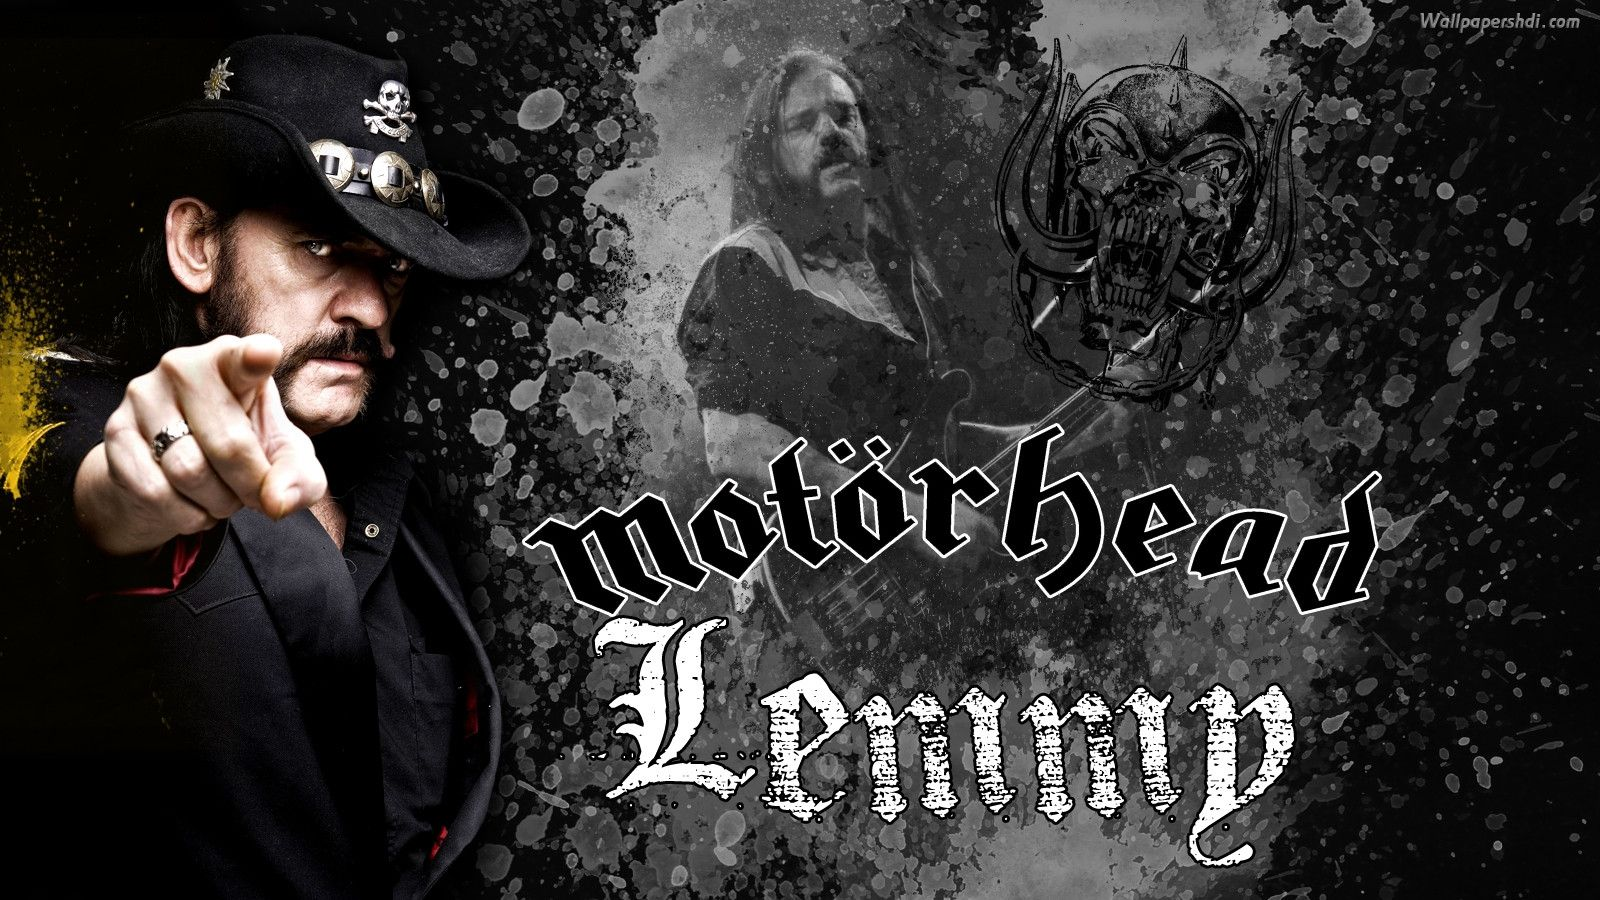 Lemmy Kilmister Rock Music Motorhead Wallpaper Hd: Free Motorhead Wallpaper HD